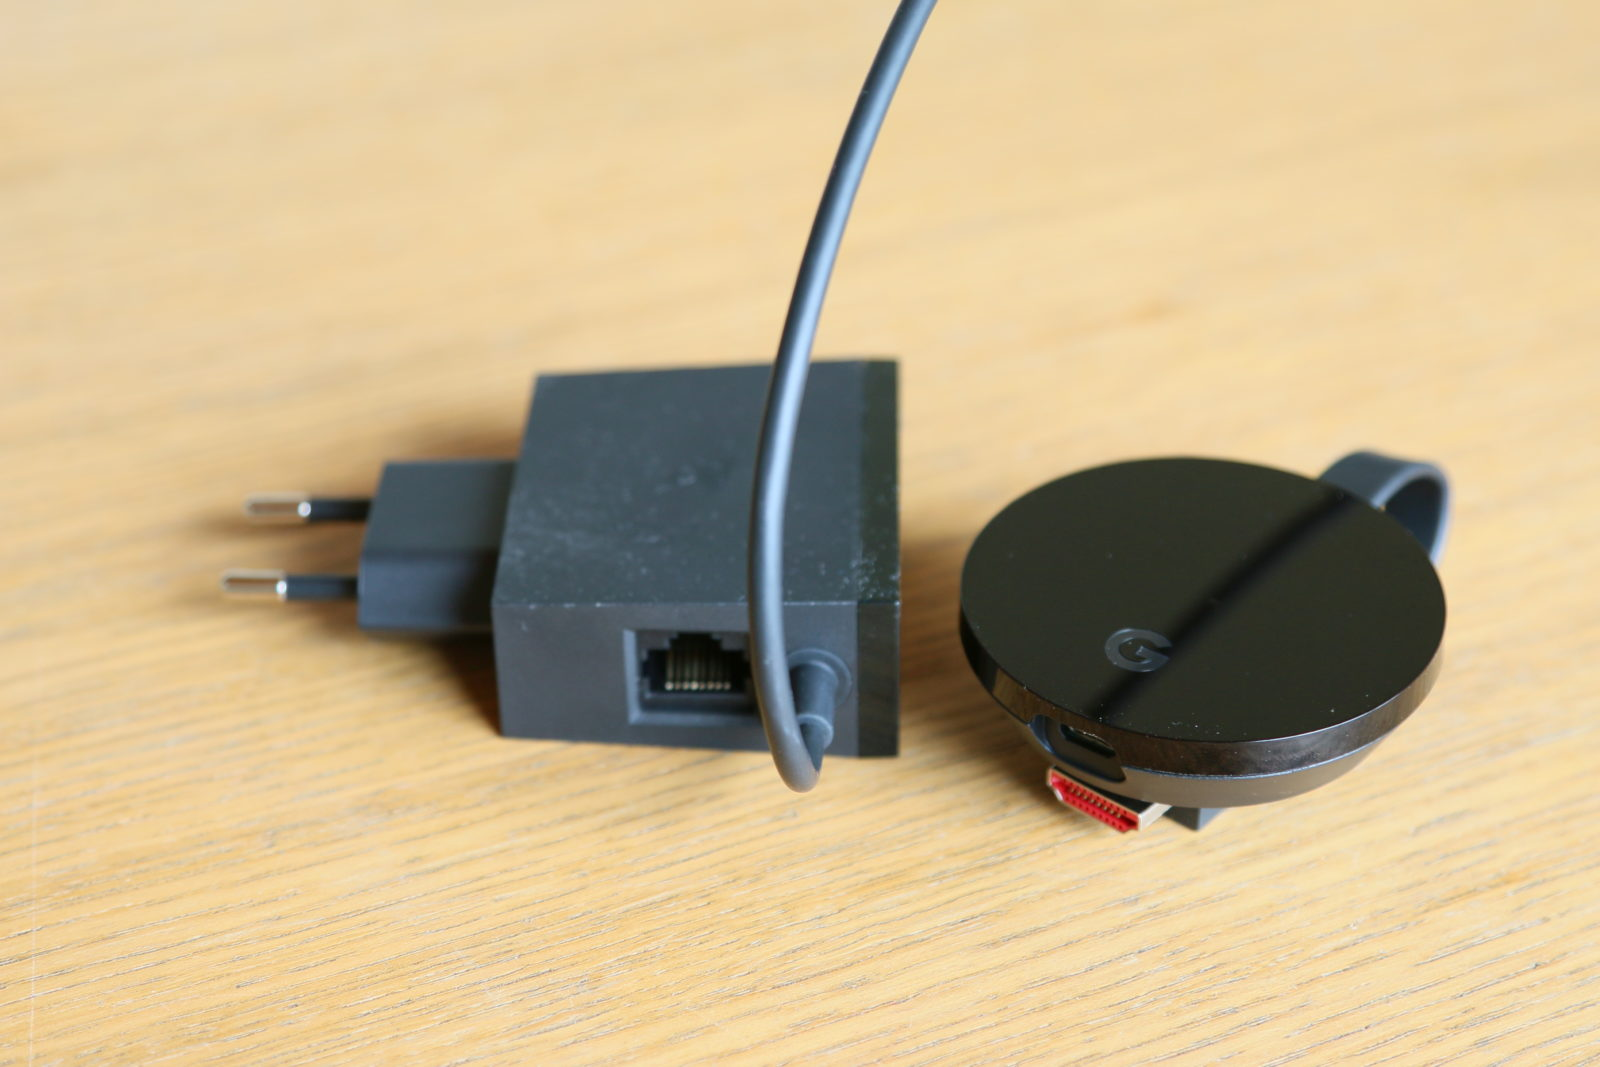 Review Google Chromecast Ultra 4k Mediastreamer